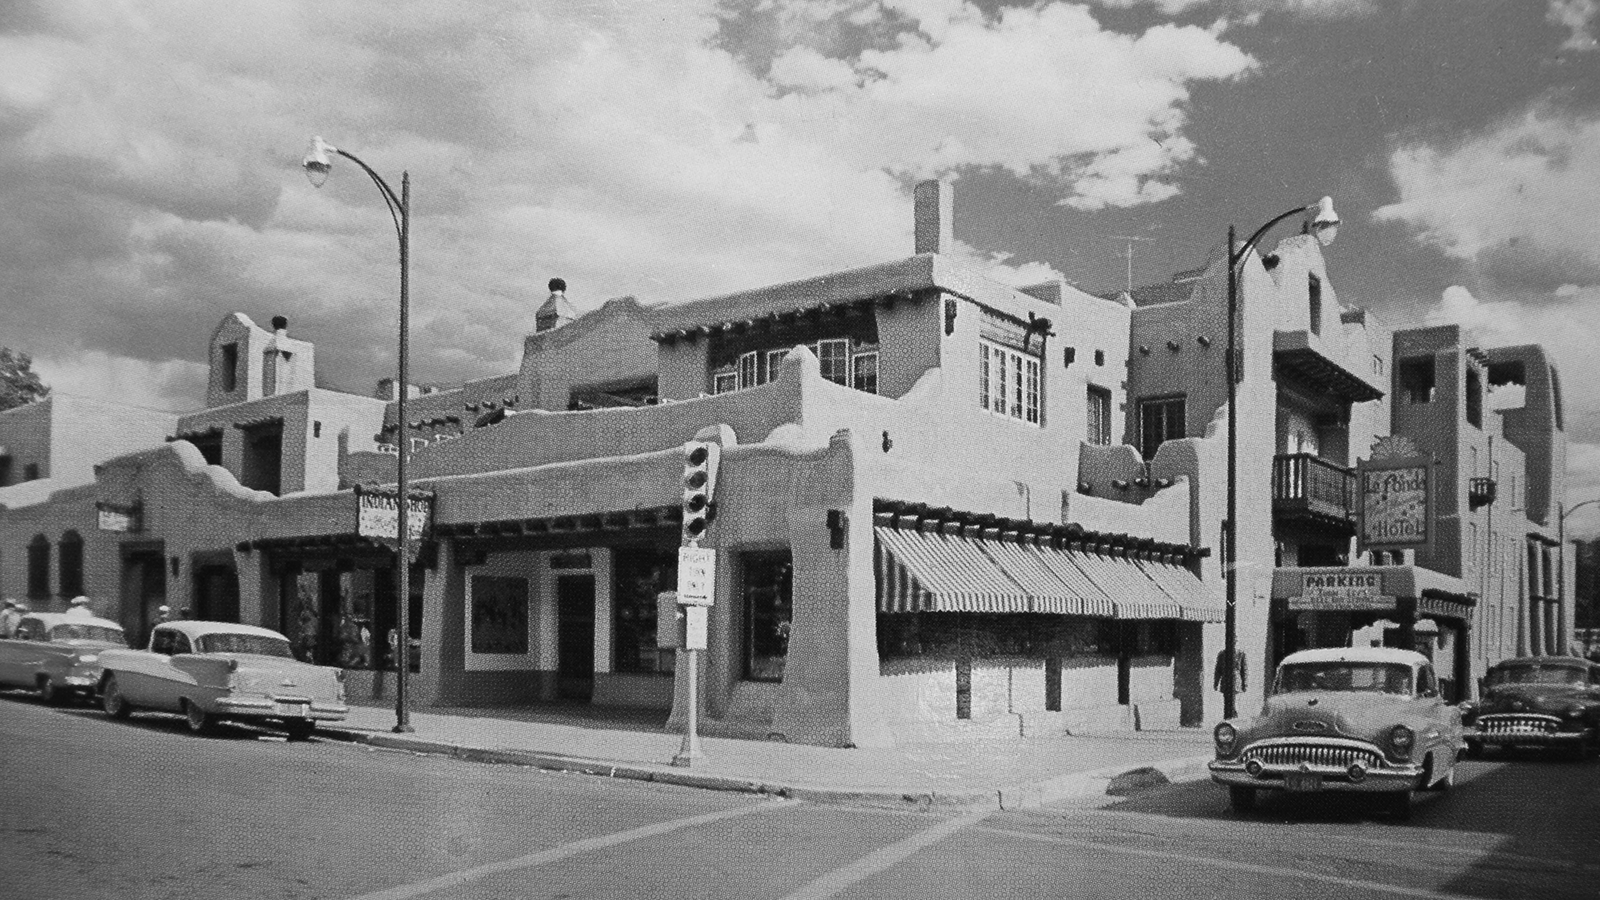 Image of Historic Exterior, La Fonda in Santa Fe, New Mexico, 1922, Member of Historic Hotels of America, Discover